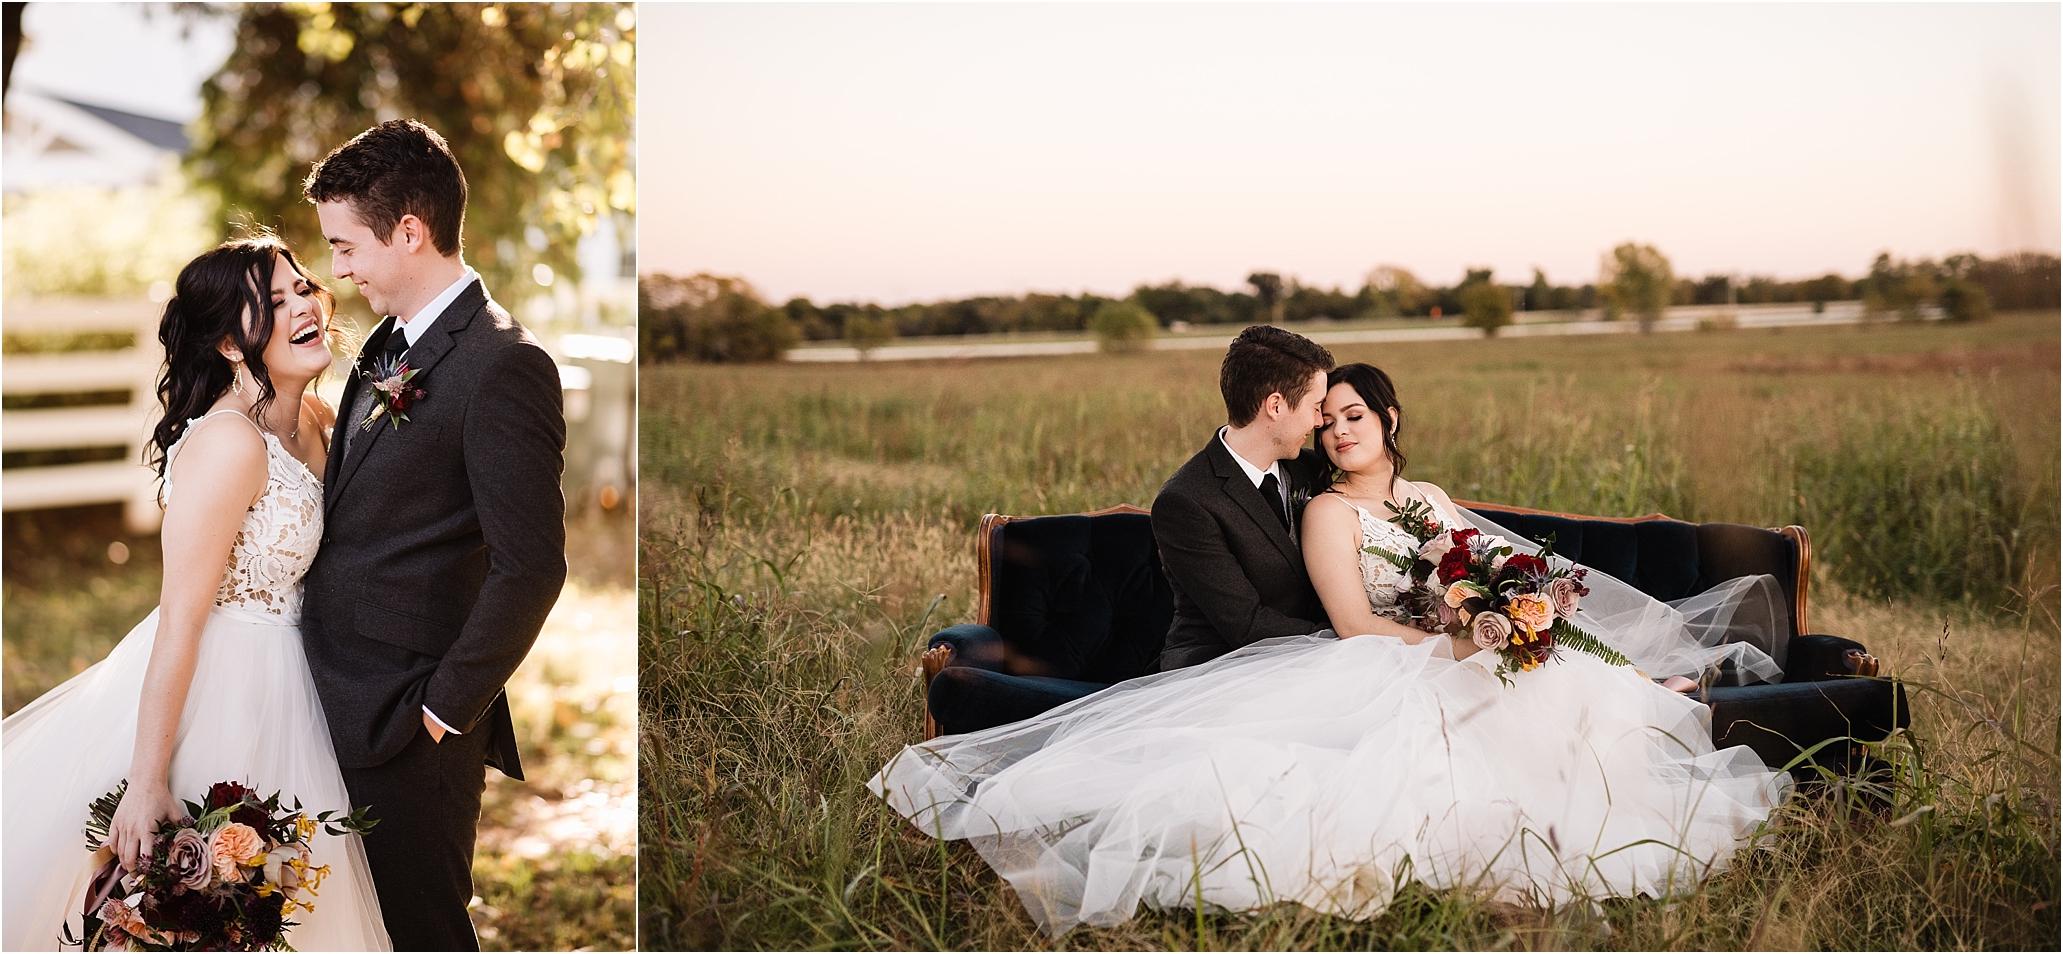 OKC_WEDDING_PHOTOGRAPHER